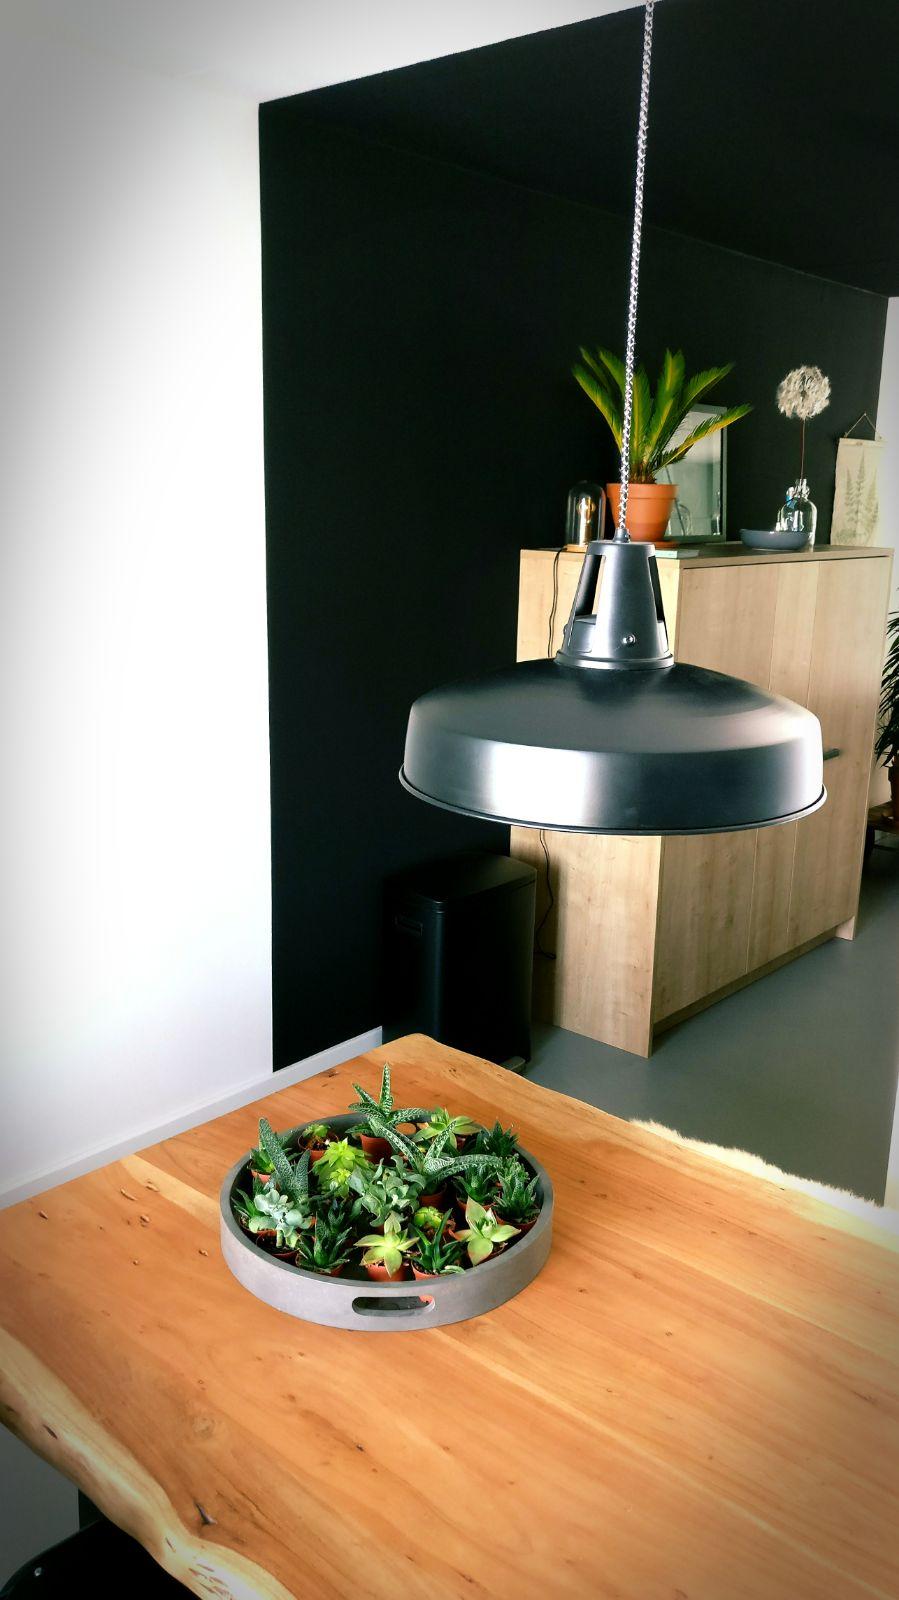 appartement nieuwbouw industrieel stoer boomstam tafel eettafel zwarte keuken eiken keuken planten urban jungle (3).jpg